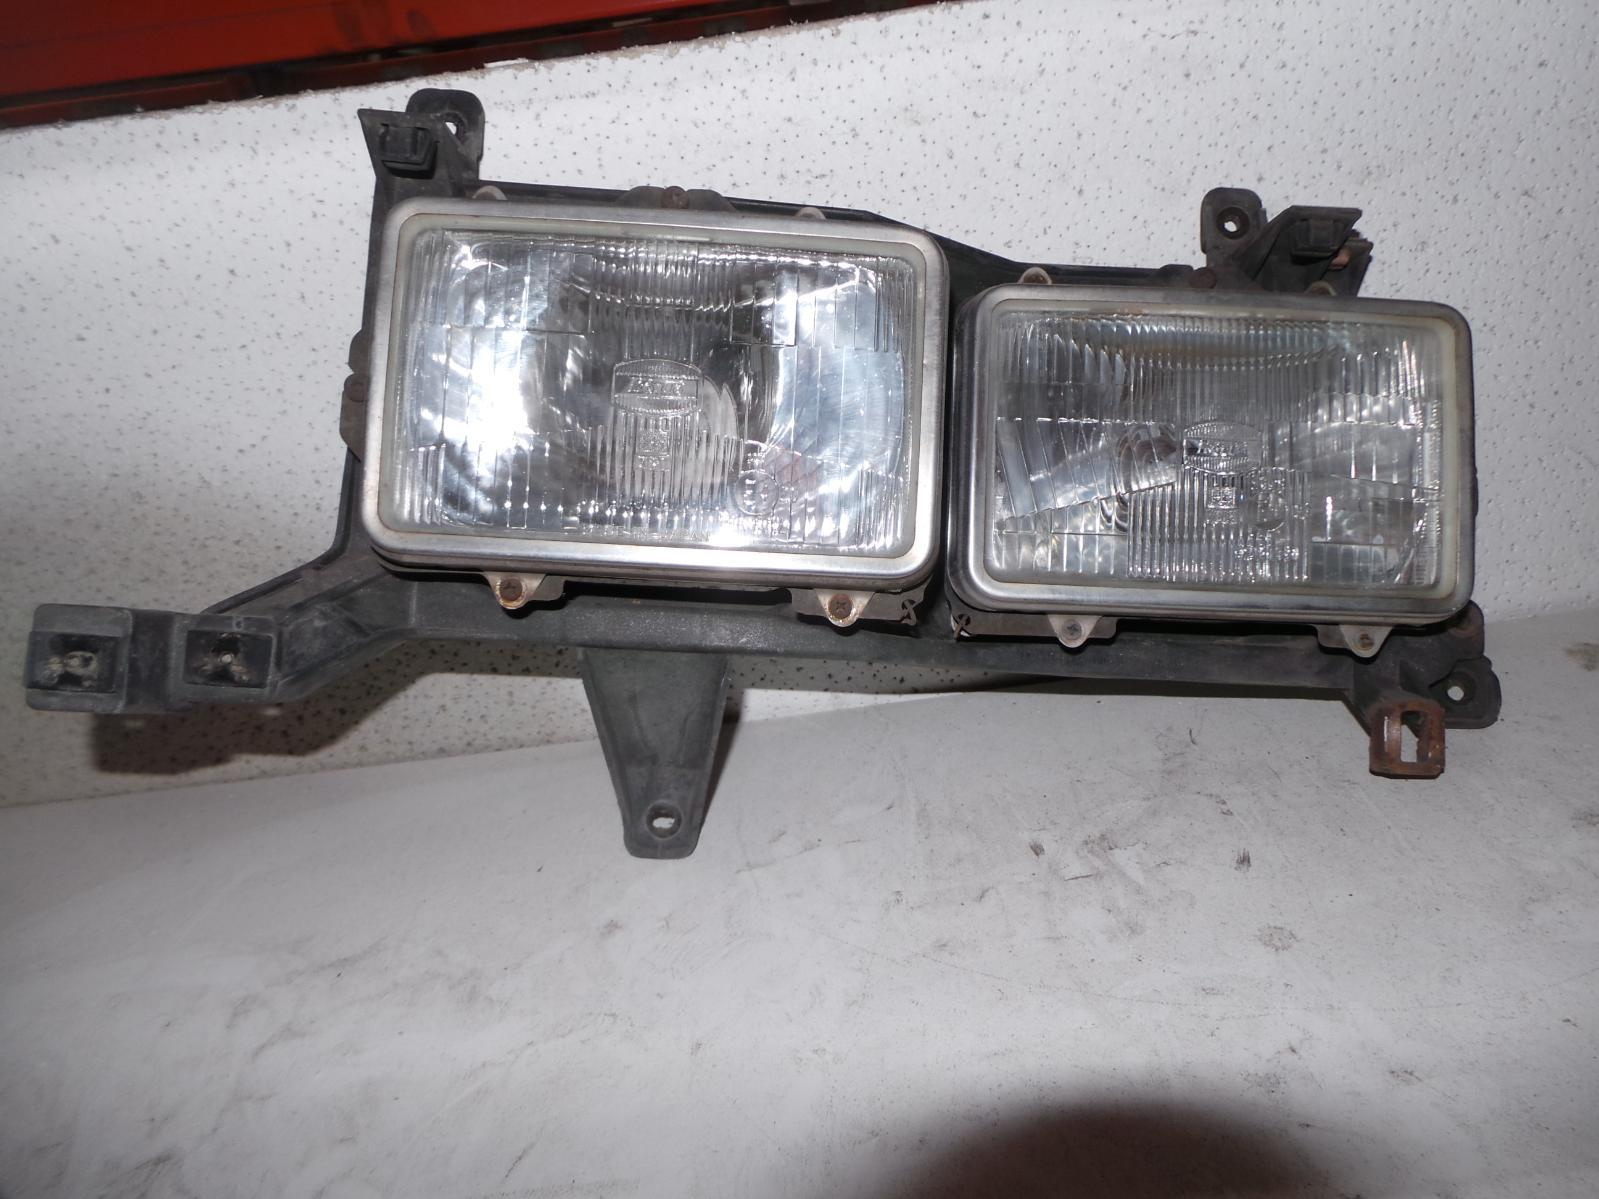 TOYOTA LANDCRUISER, Left Headlamp, 80 SERIES, GX/GXL, TWIN SQUARE, 05/90-03/98